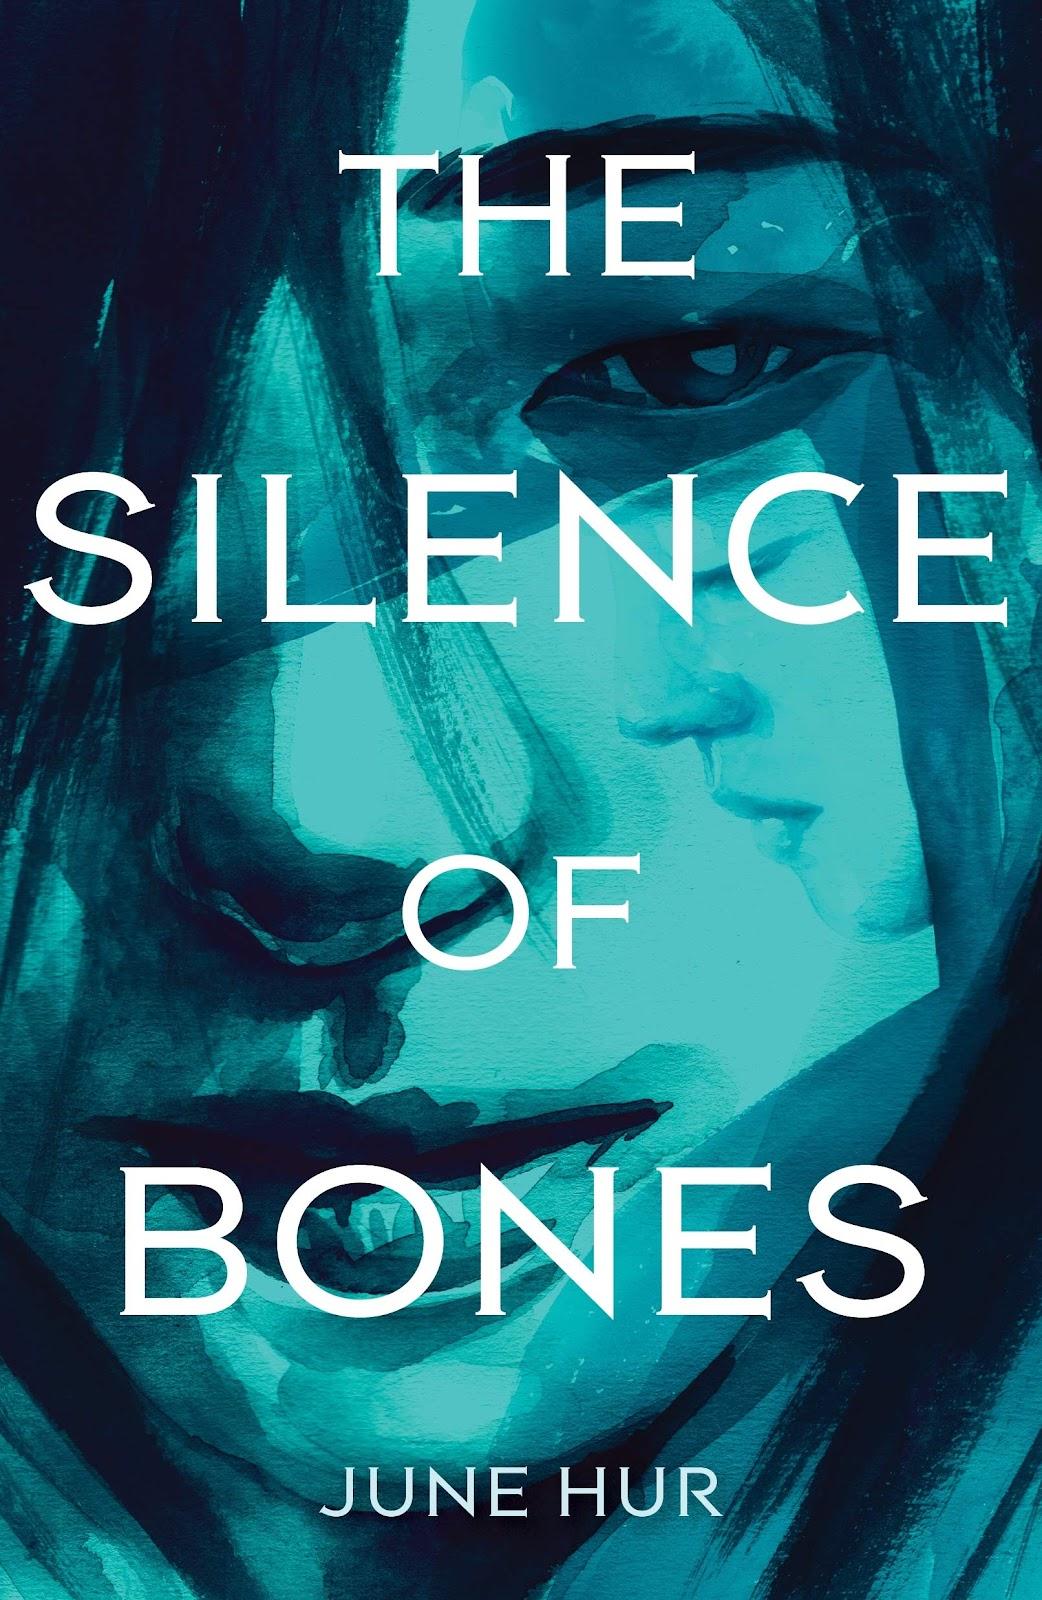 Amazon.com: The Silence of Bones (9781250229557): Hur, June: Books